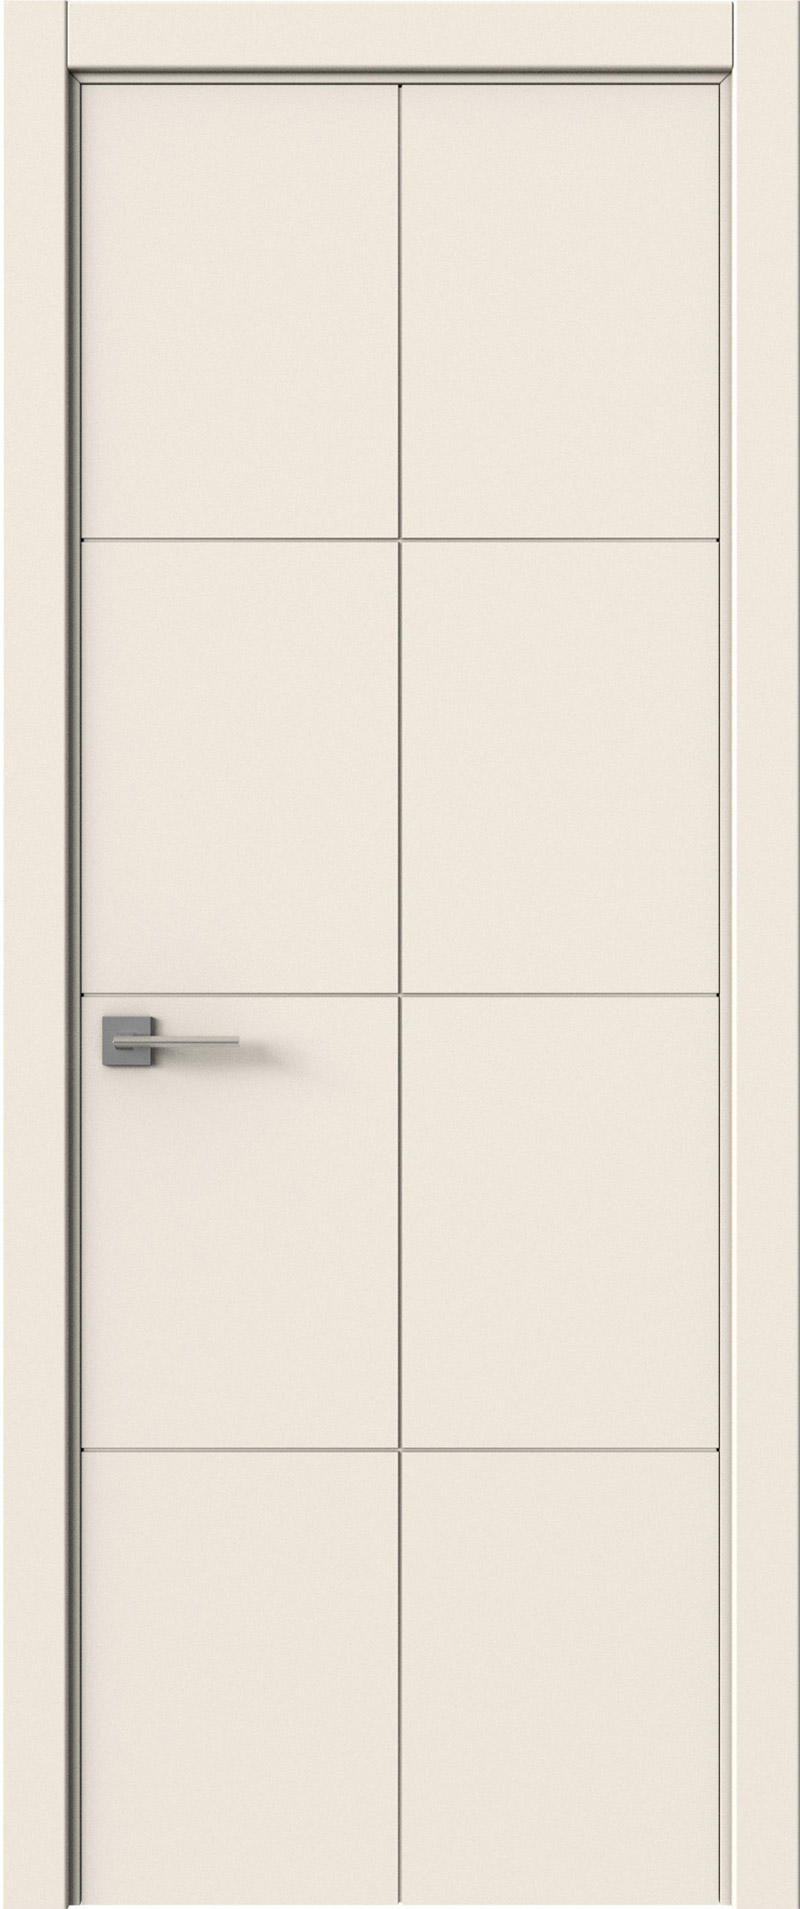 Tivoli Л-2 цвет - Бежевая эмаль (RAL 9010) Без стекла (ДГ)